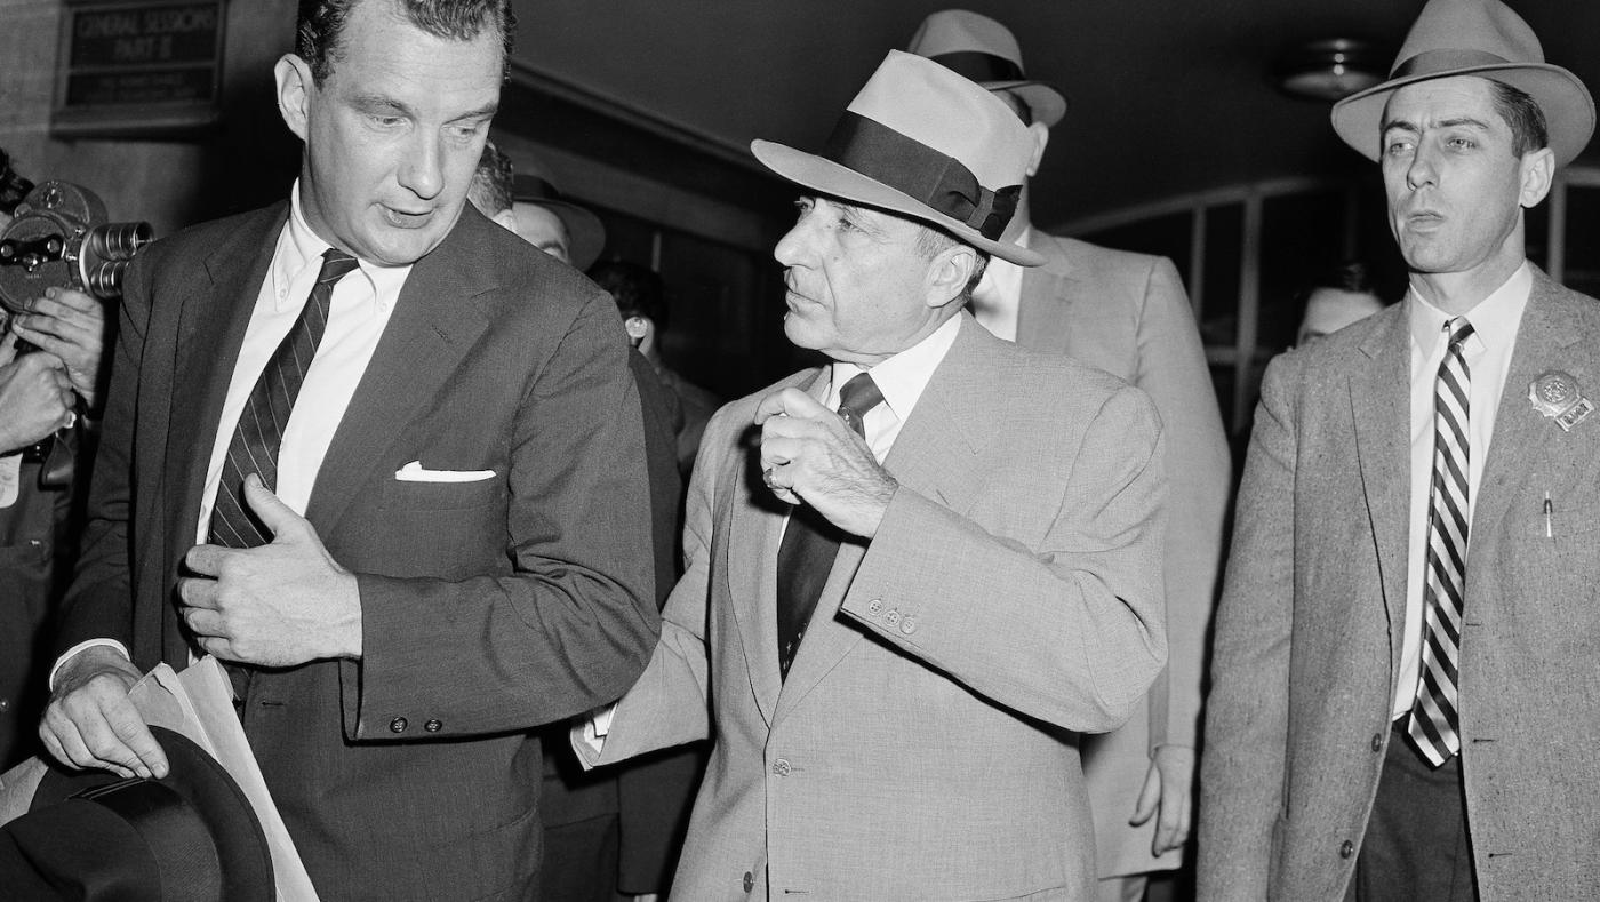 Feds: Acting boss of Bonanno crime family among 10